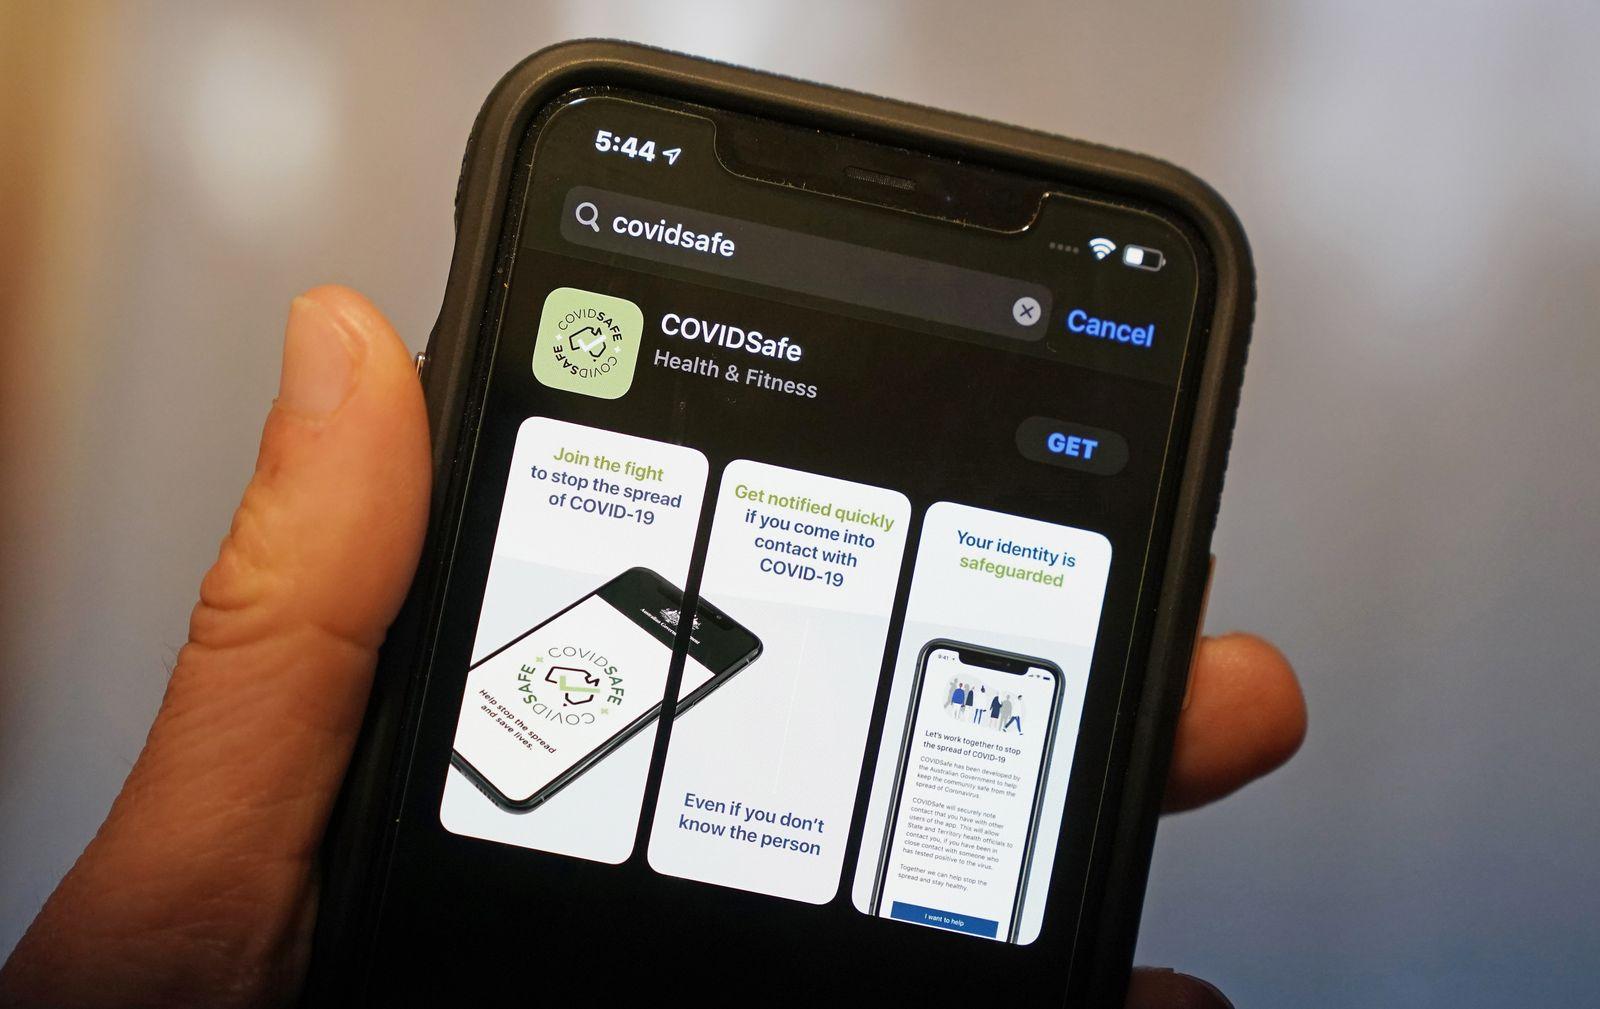 Coronavirus - Freiwillige Corona-App in Australien